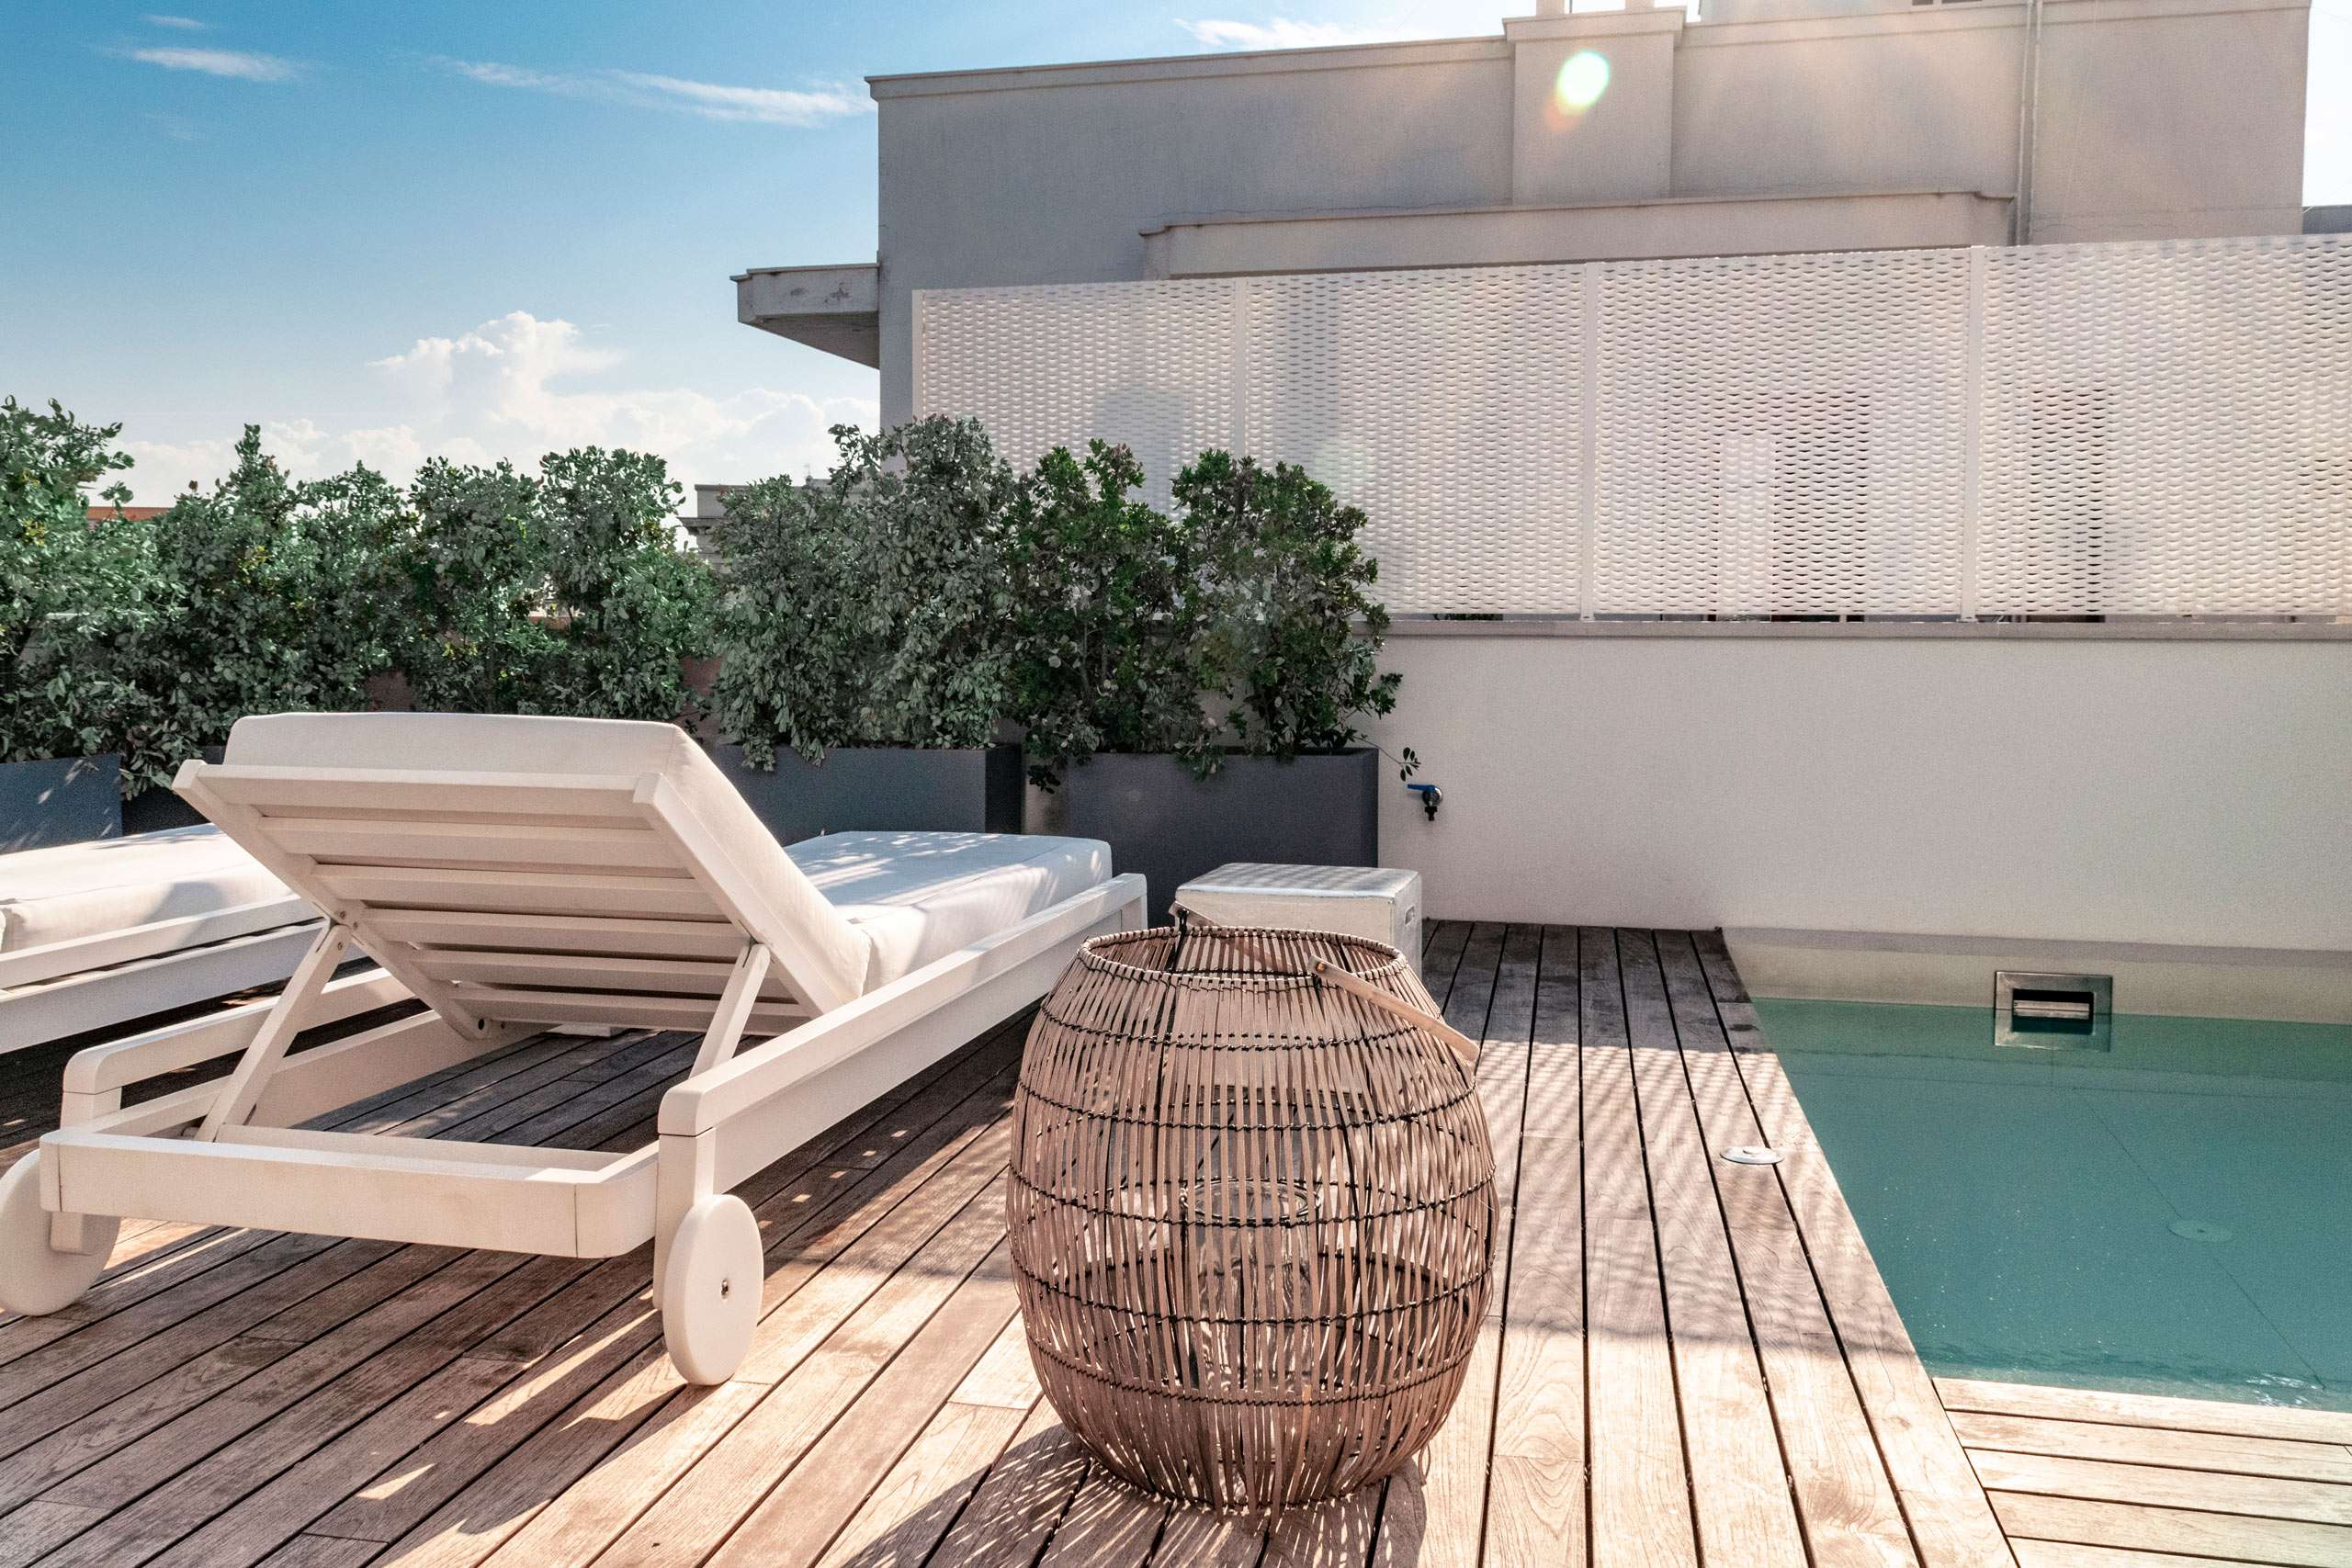 Terrace with swimming pool at Cinquevite luxury flats at Polignano a Mare | Puglia